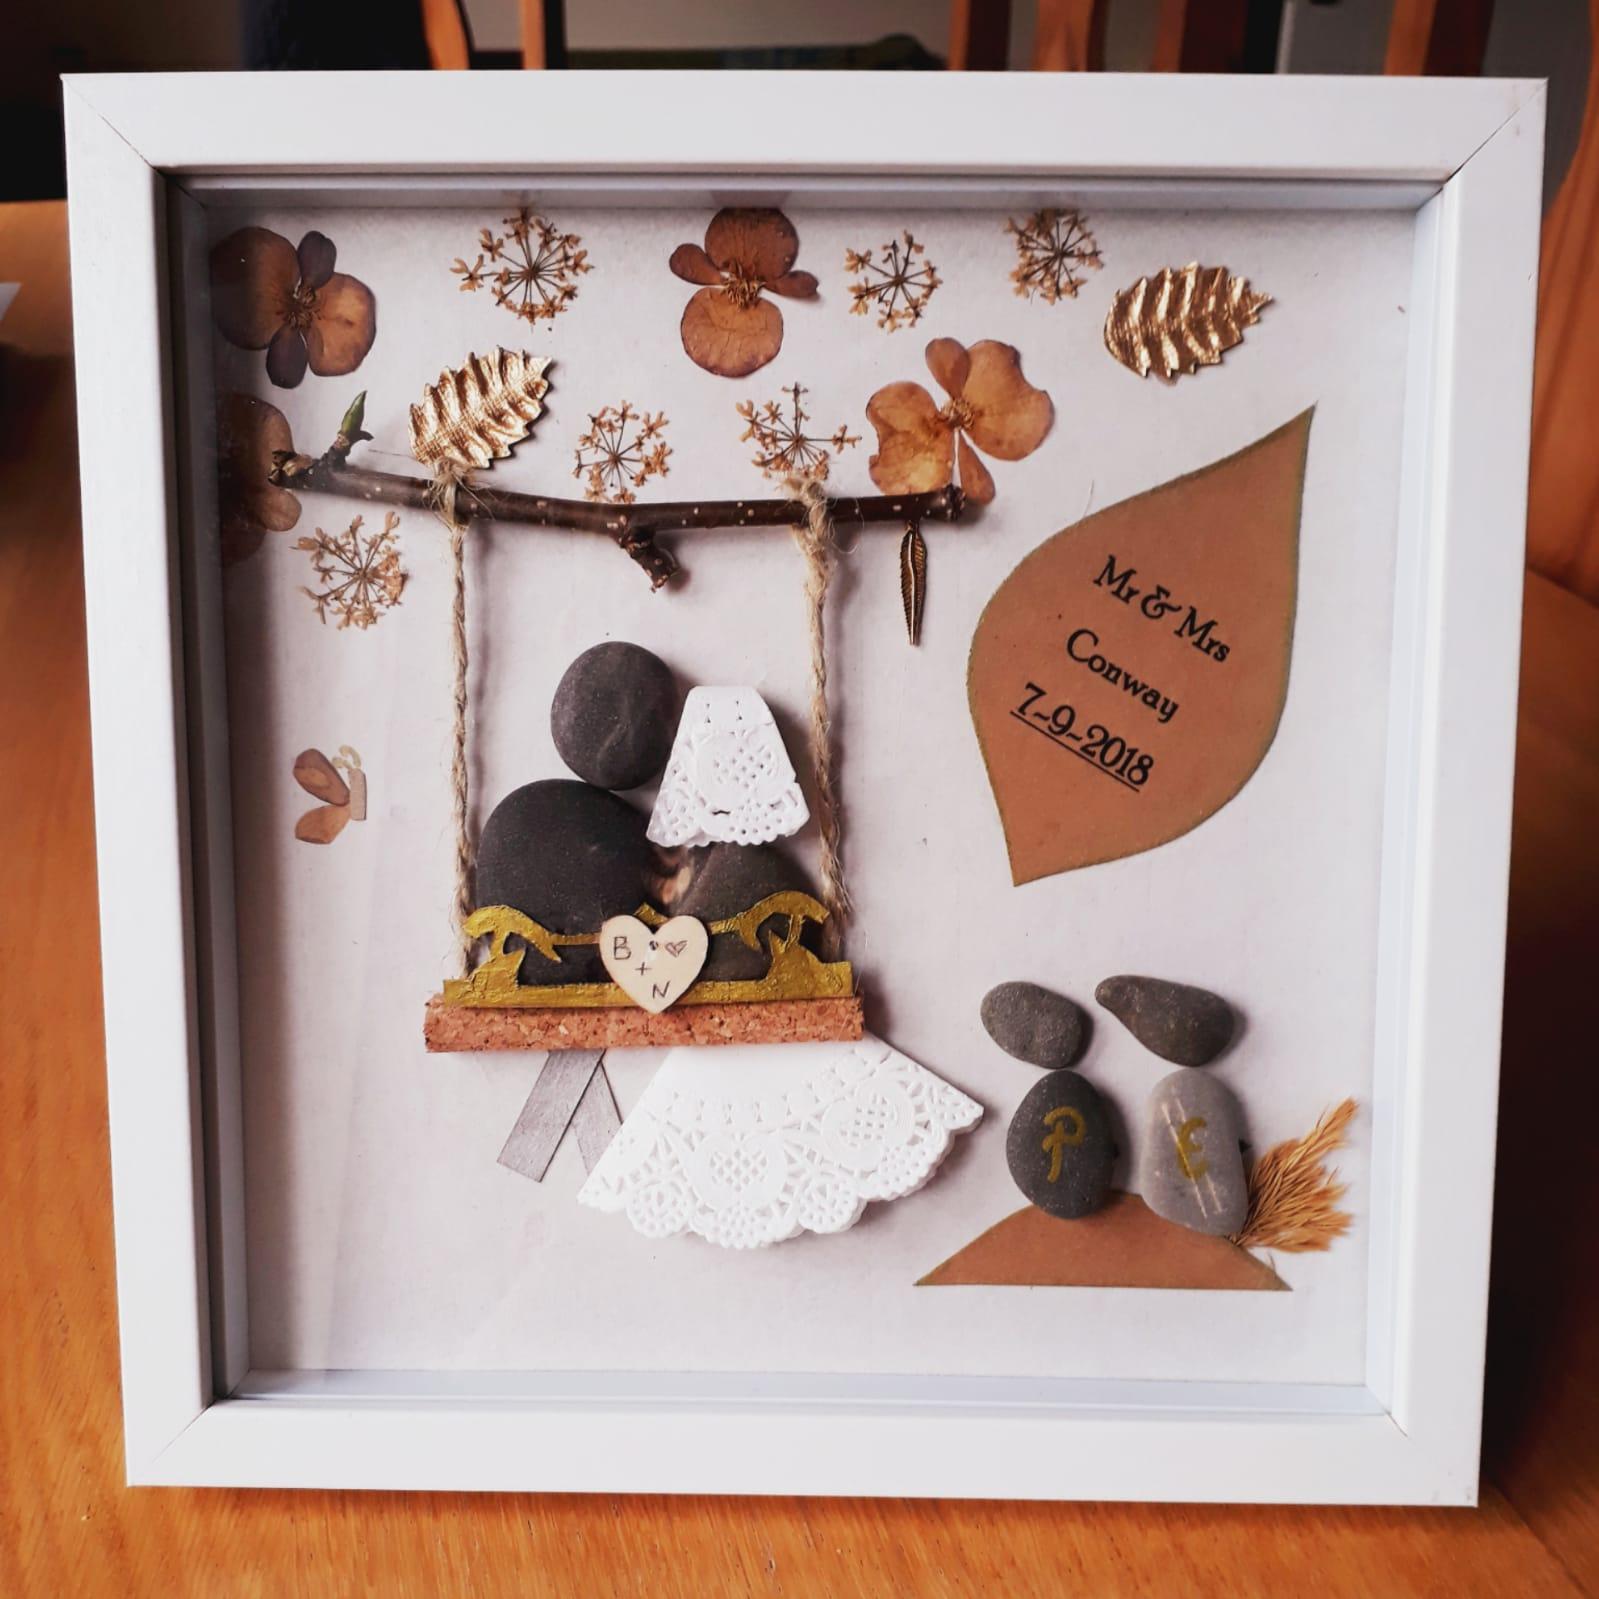 Thoughtful Wedding Gift Ideas: Mr & Mrs Frame